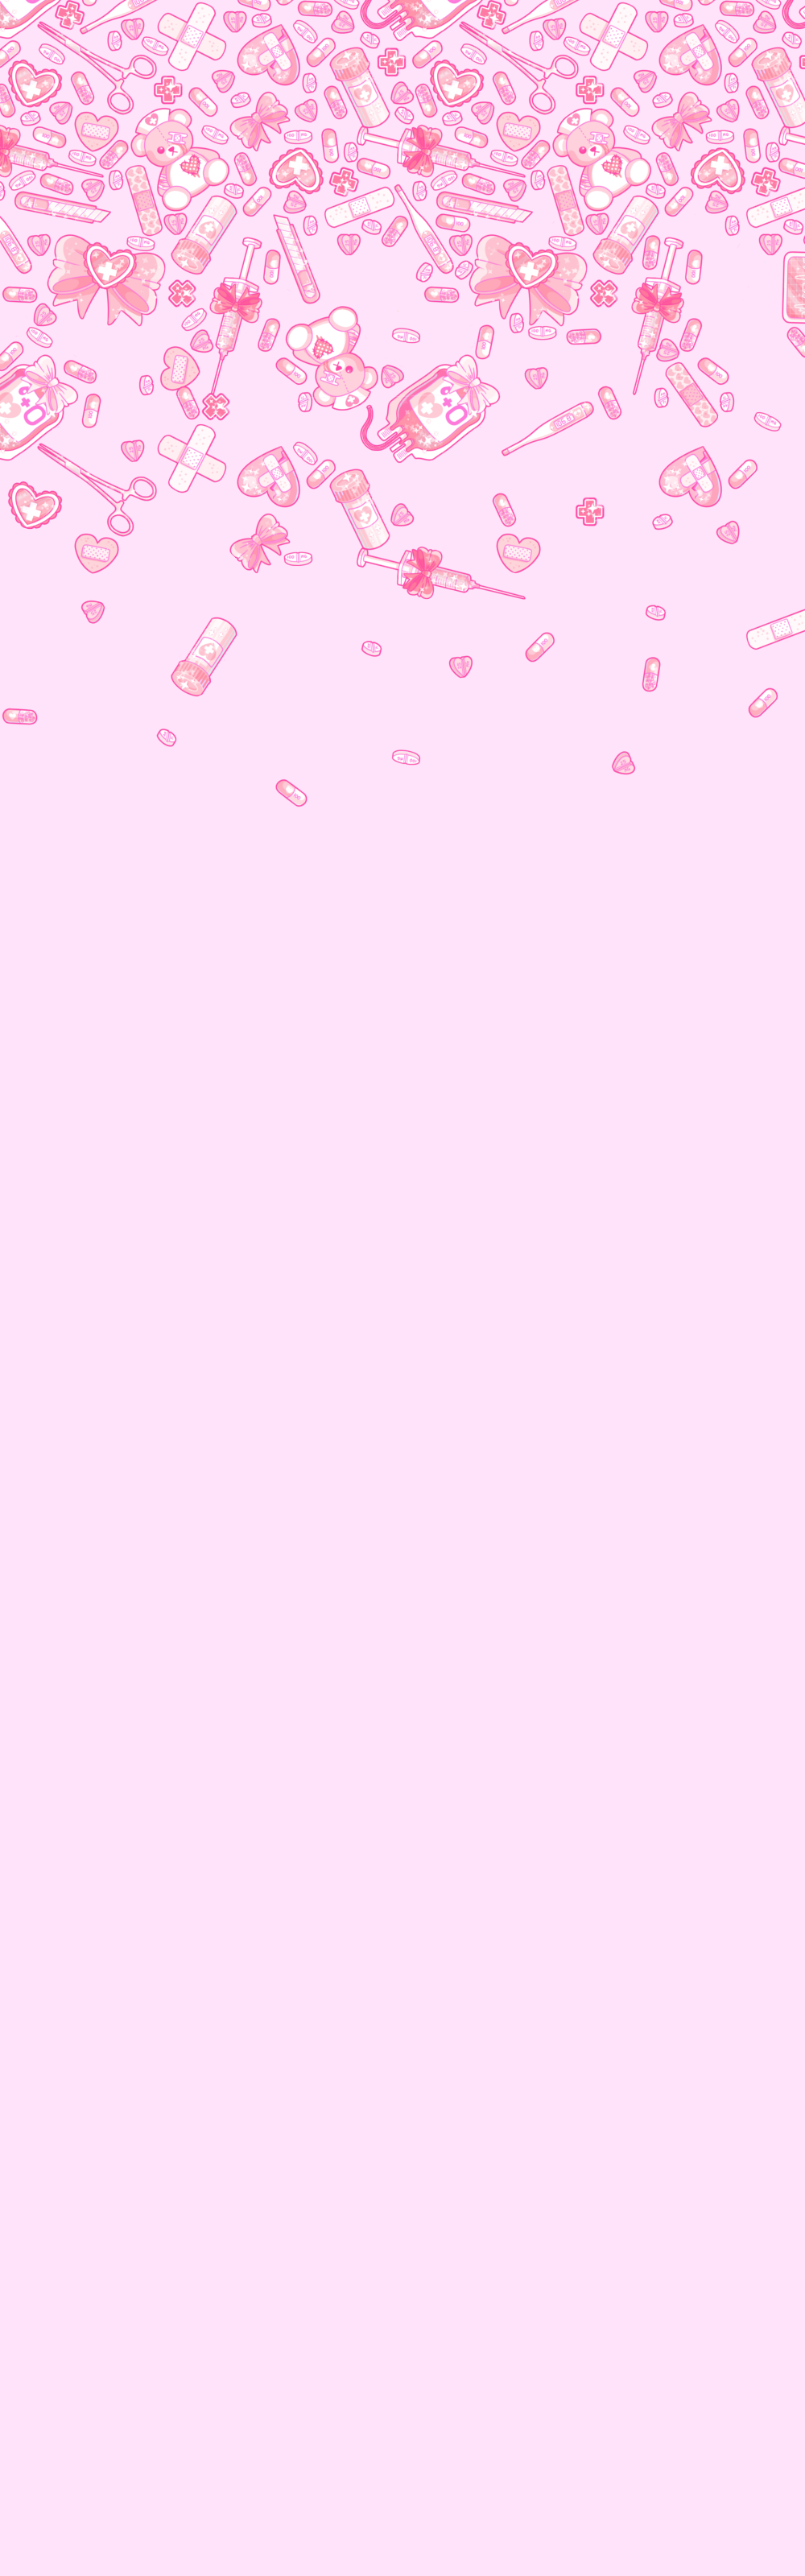 Menhera Custom Box Background By King Lulu Deer Cute Pastel Wallpaper Iphone Background Wallpaper Kawaii Background